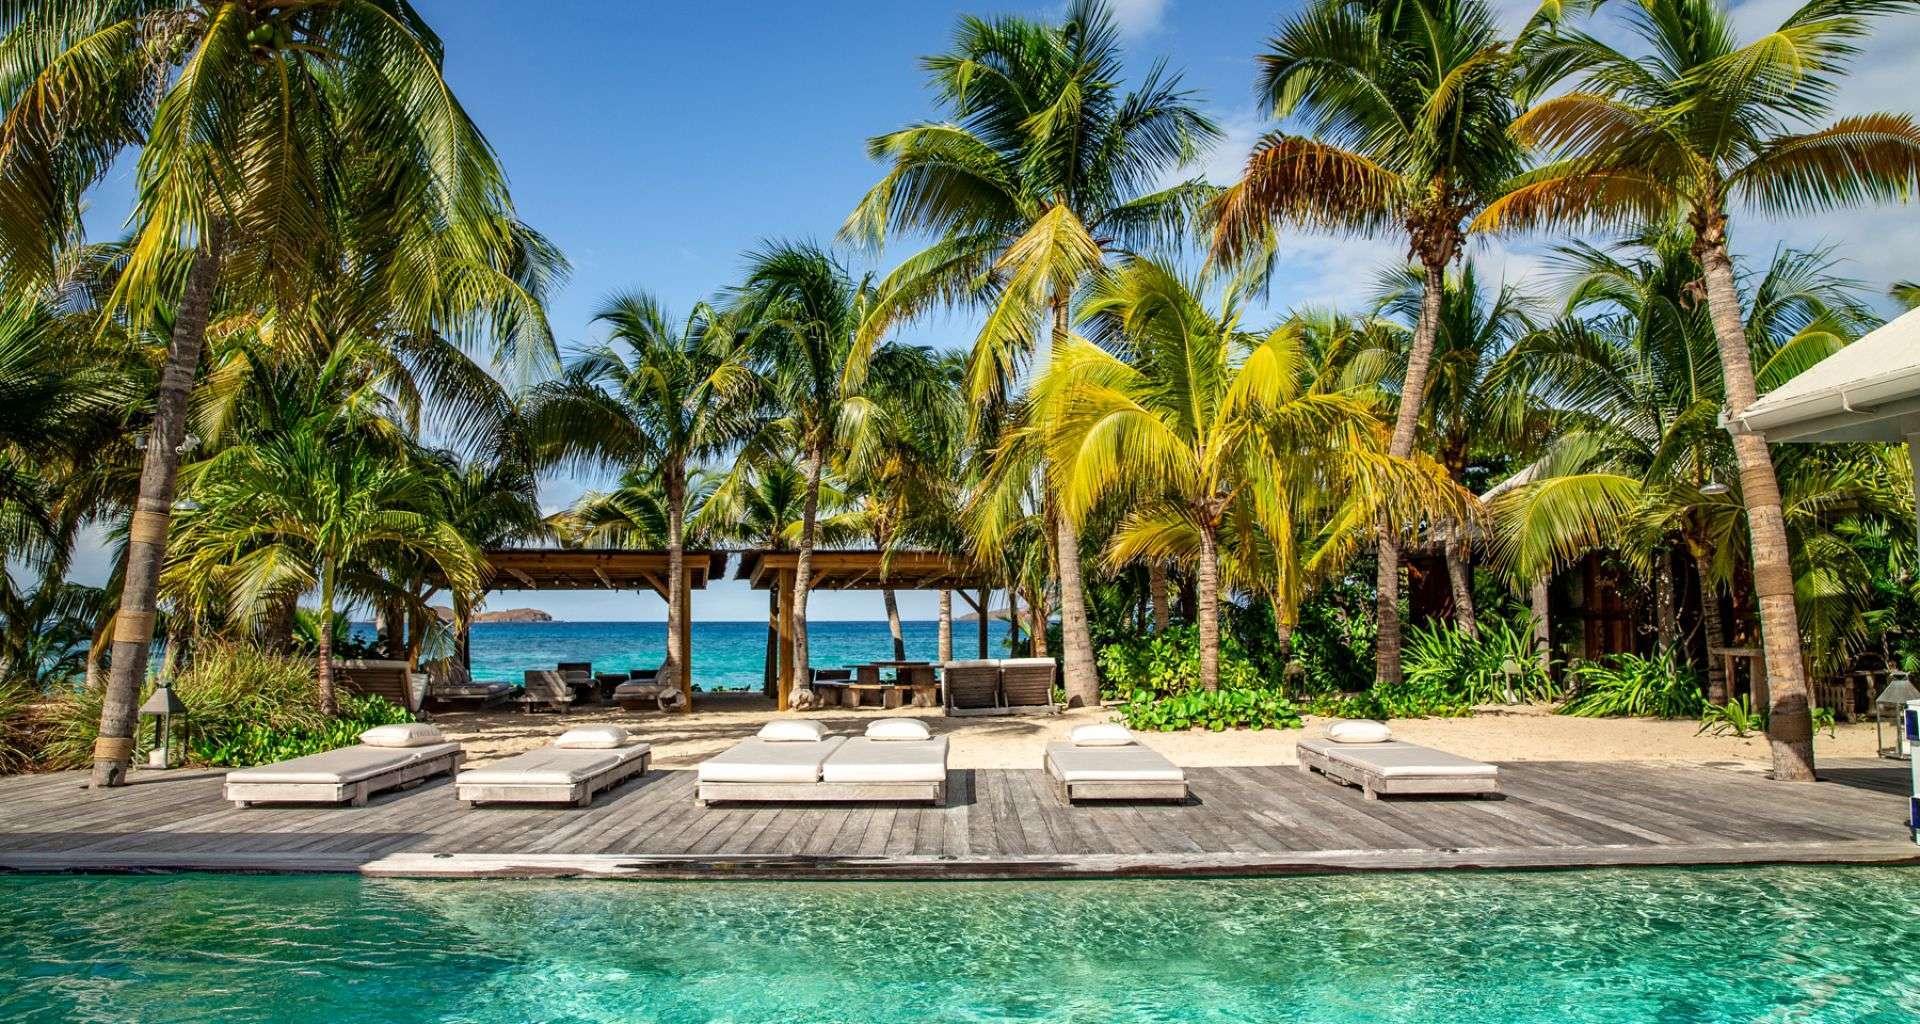 Luxury villa rentals caribbean - St barthelemy - Lorient - Dei Sogni - Image 1/14